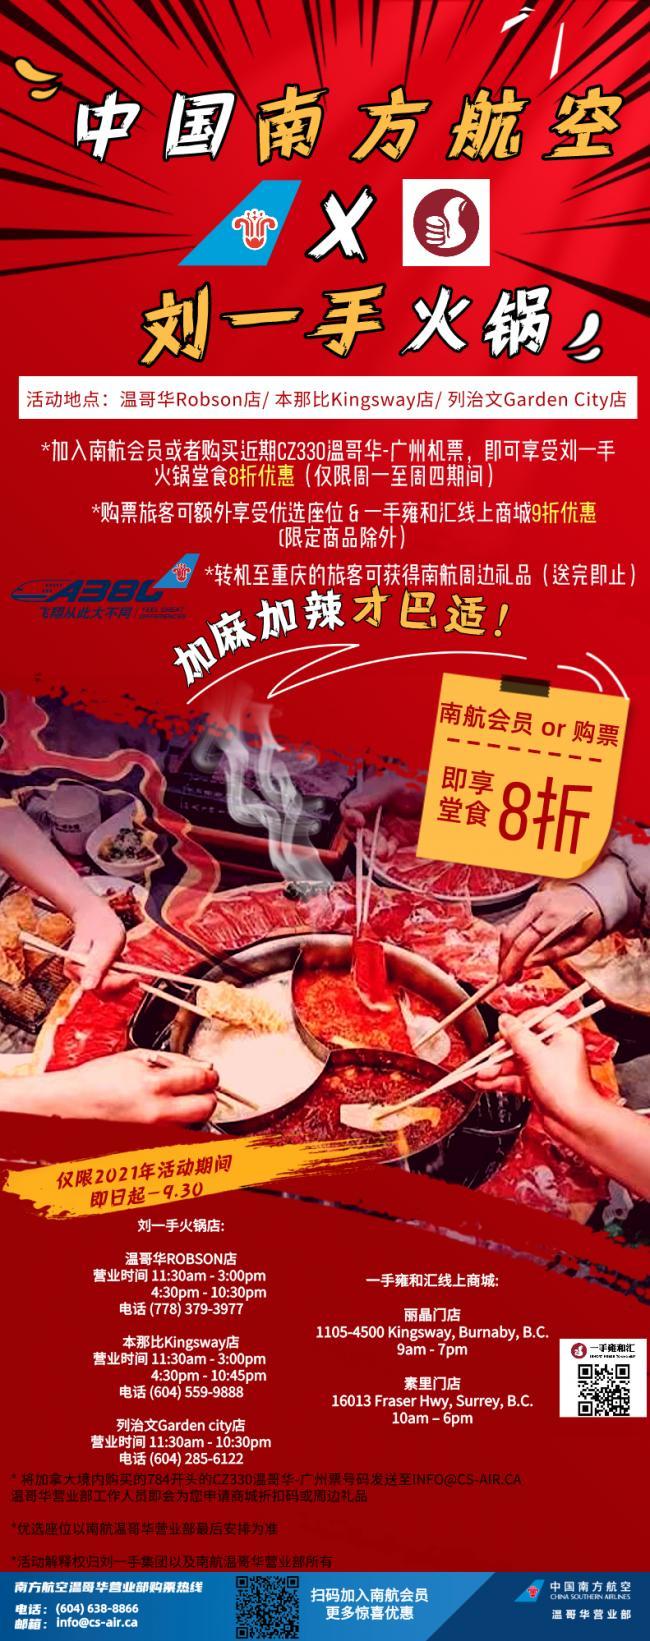 WeChat Image_20210609134711.png